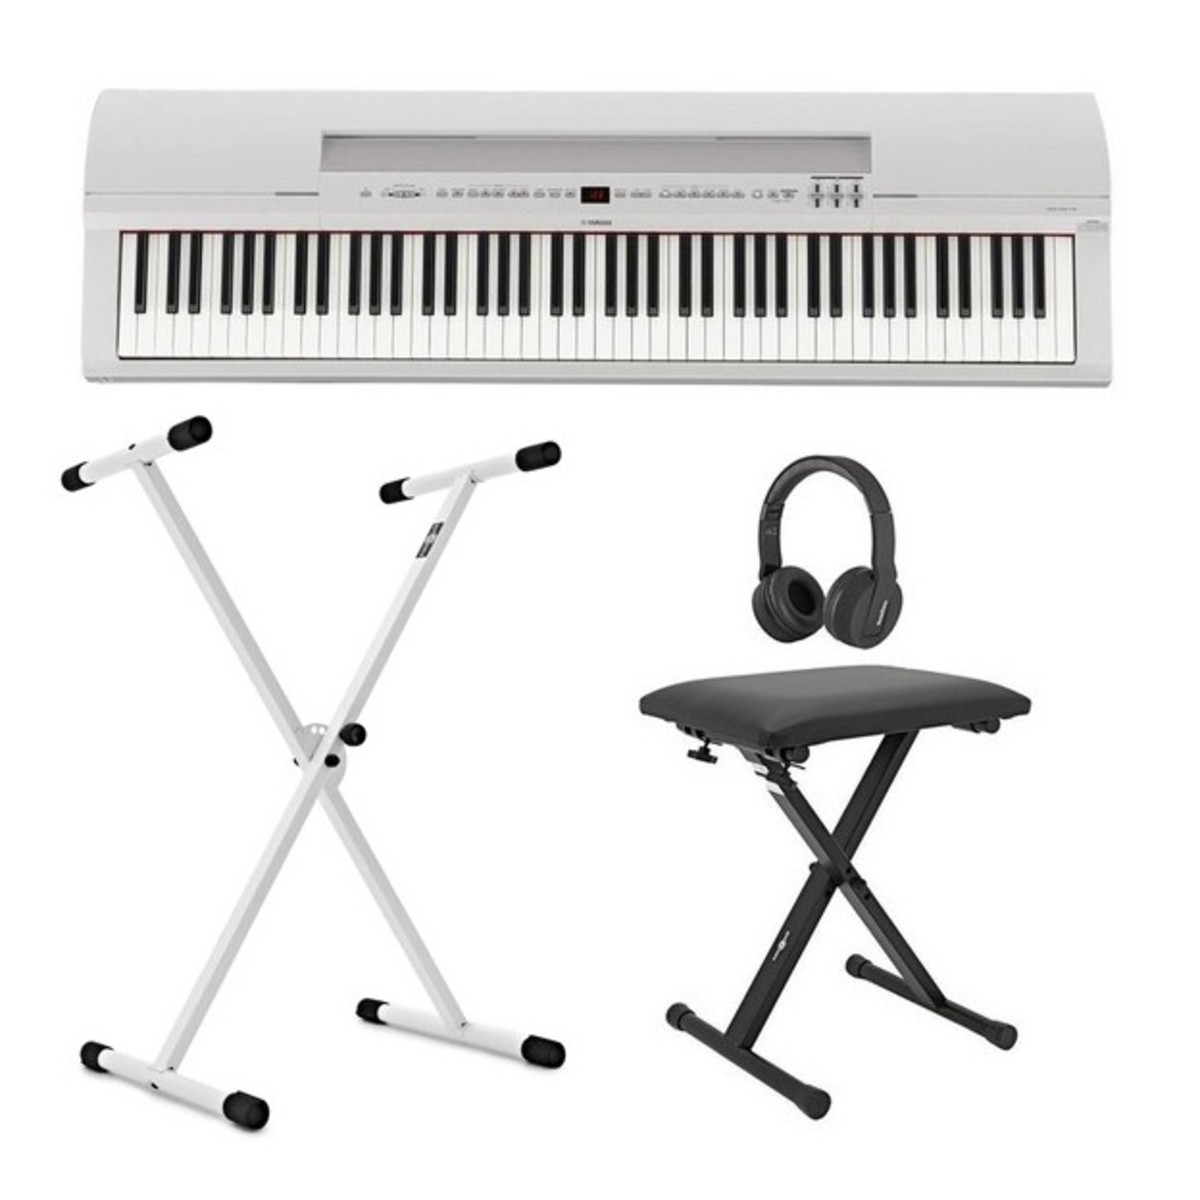 Yamaha P255 Digitalpiano, weiß, im Paket mit X-Rahmen bei Gear4music